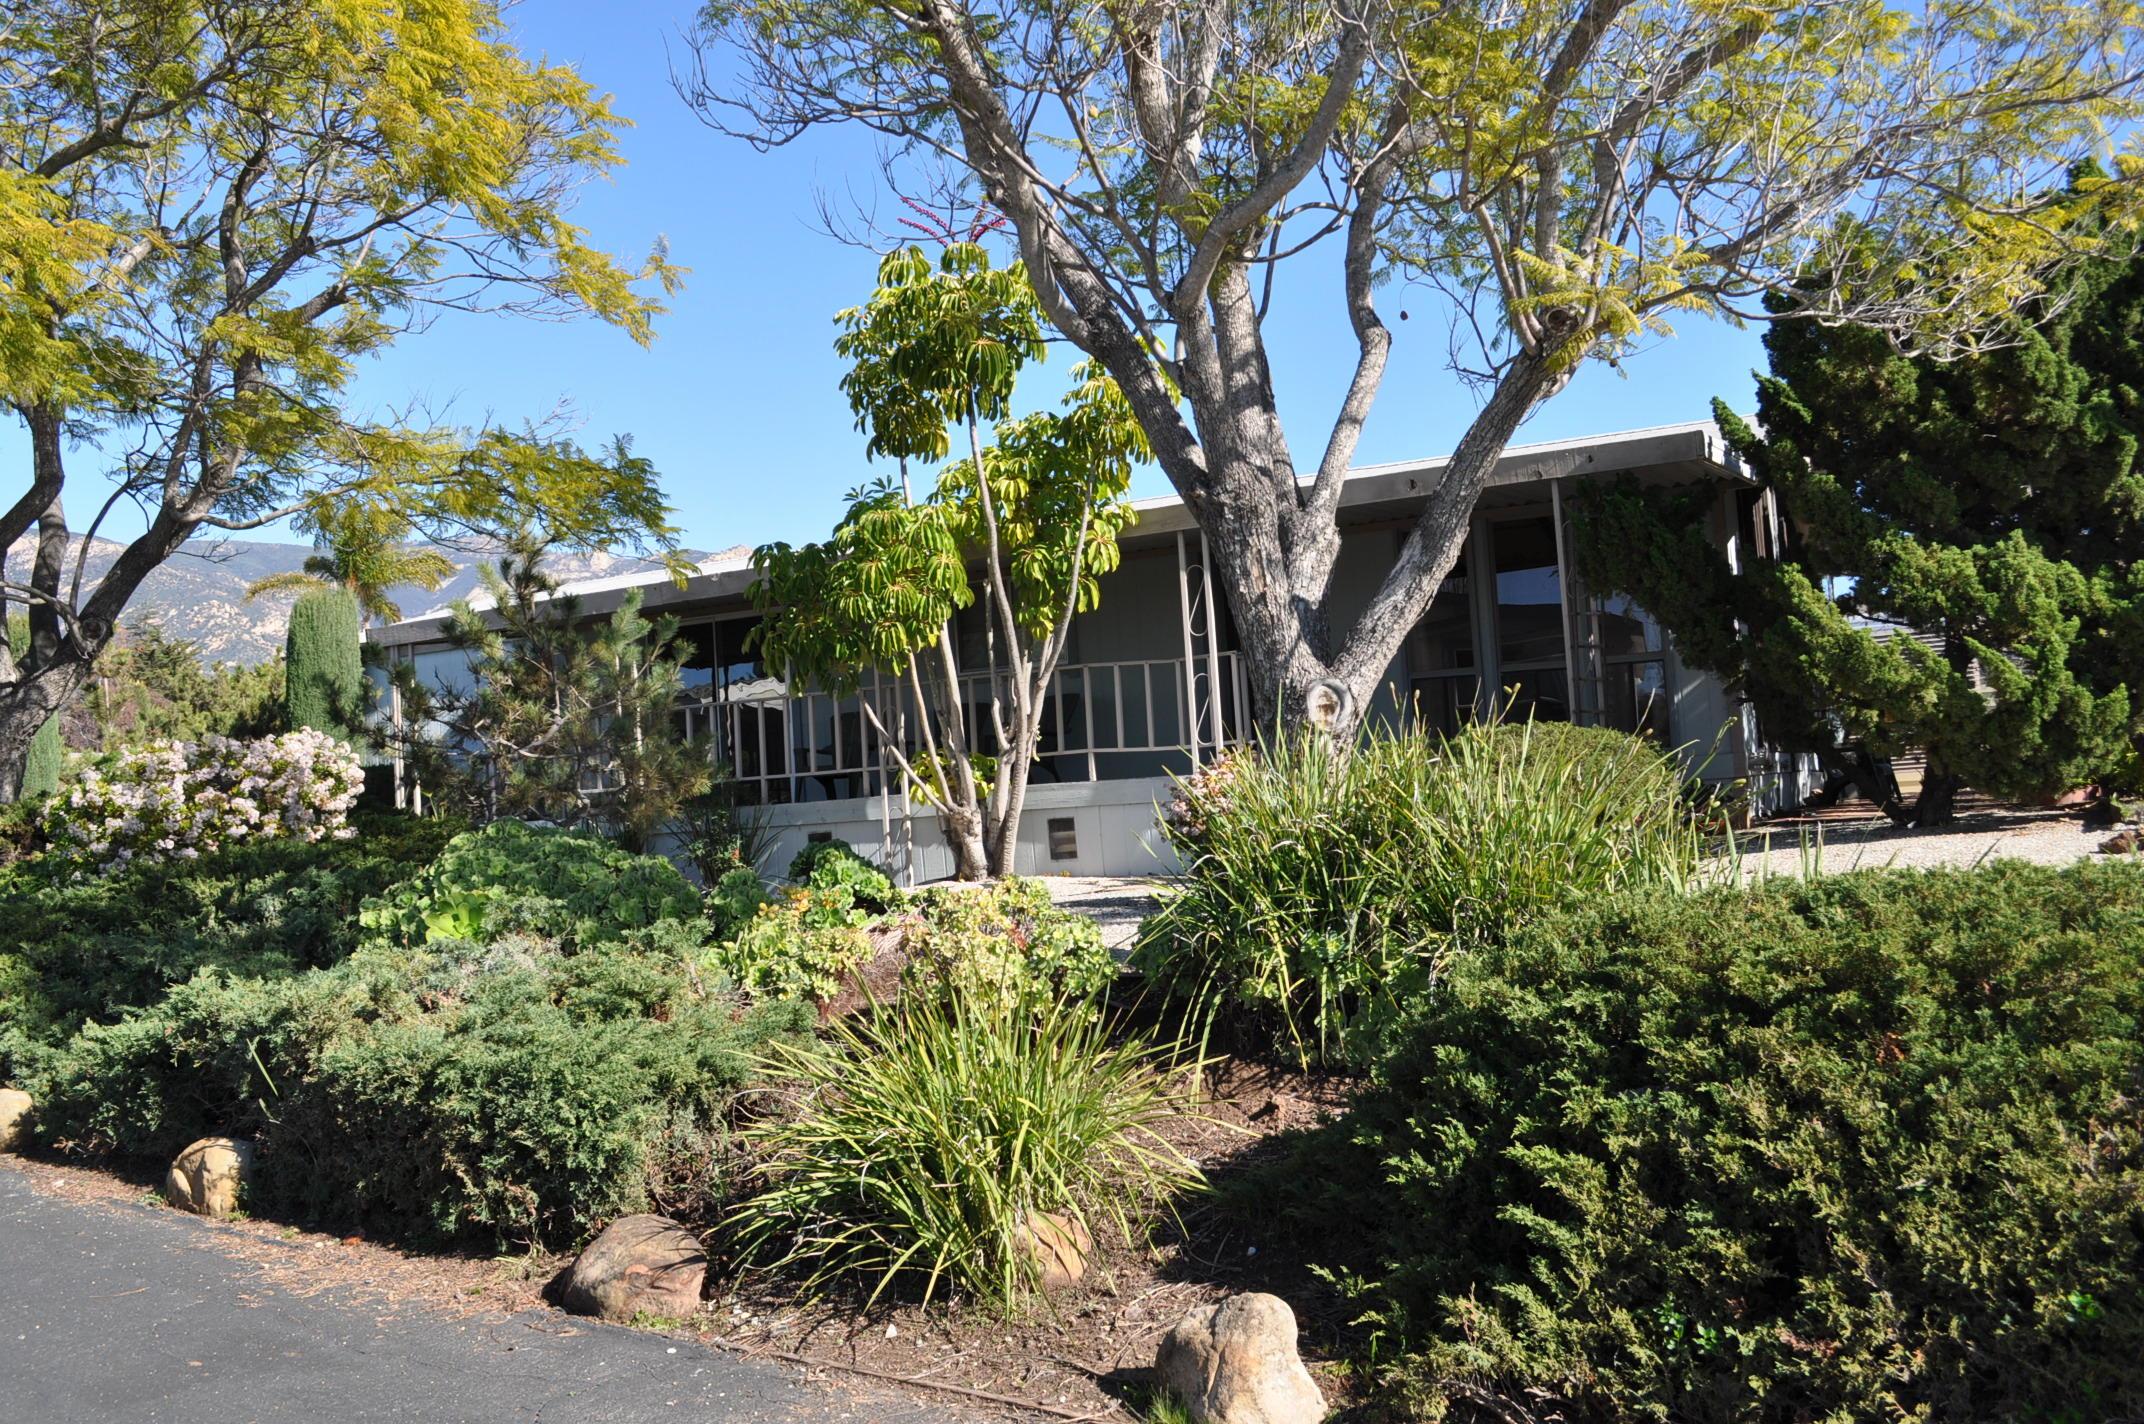 Property photo for 340 Old Mill Rd #150 Santa Barbara, California 93110 - 17-184